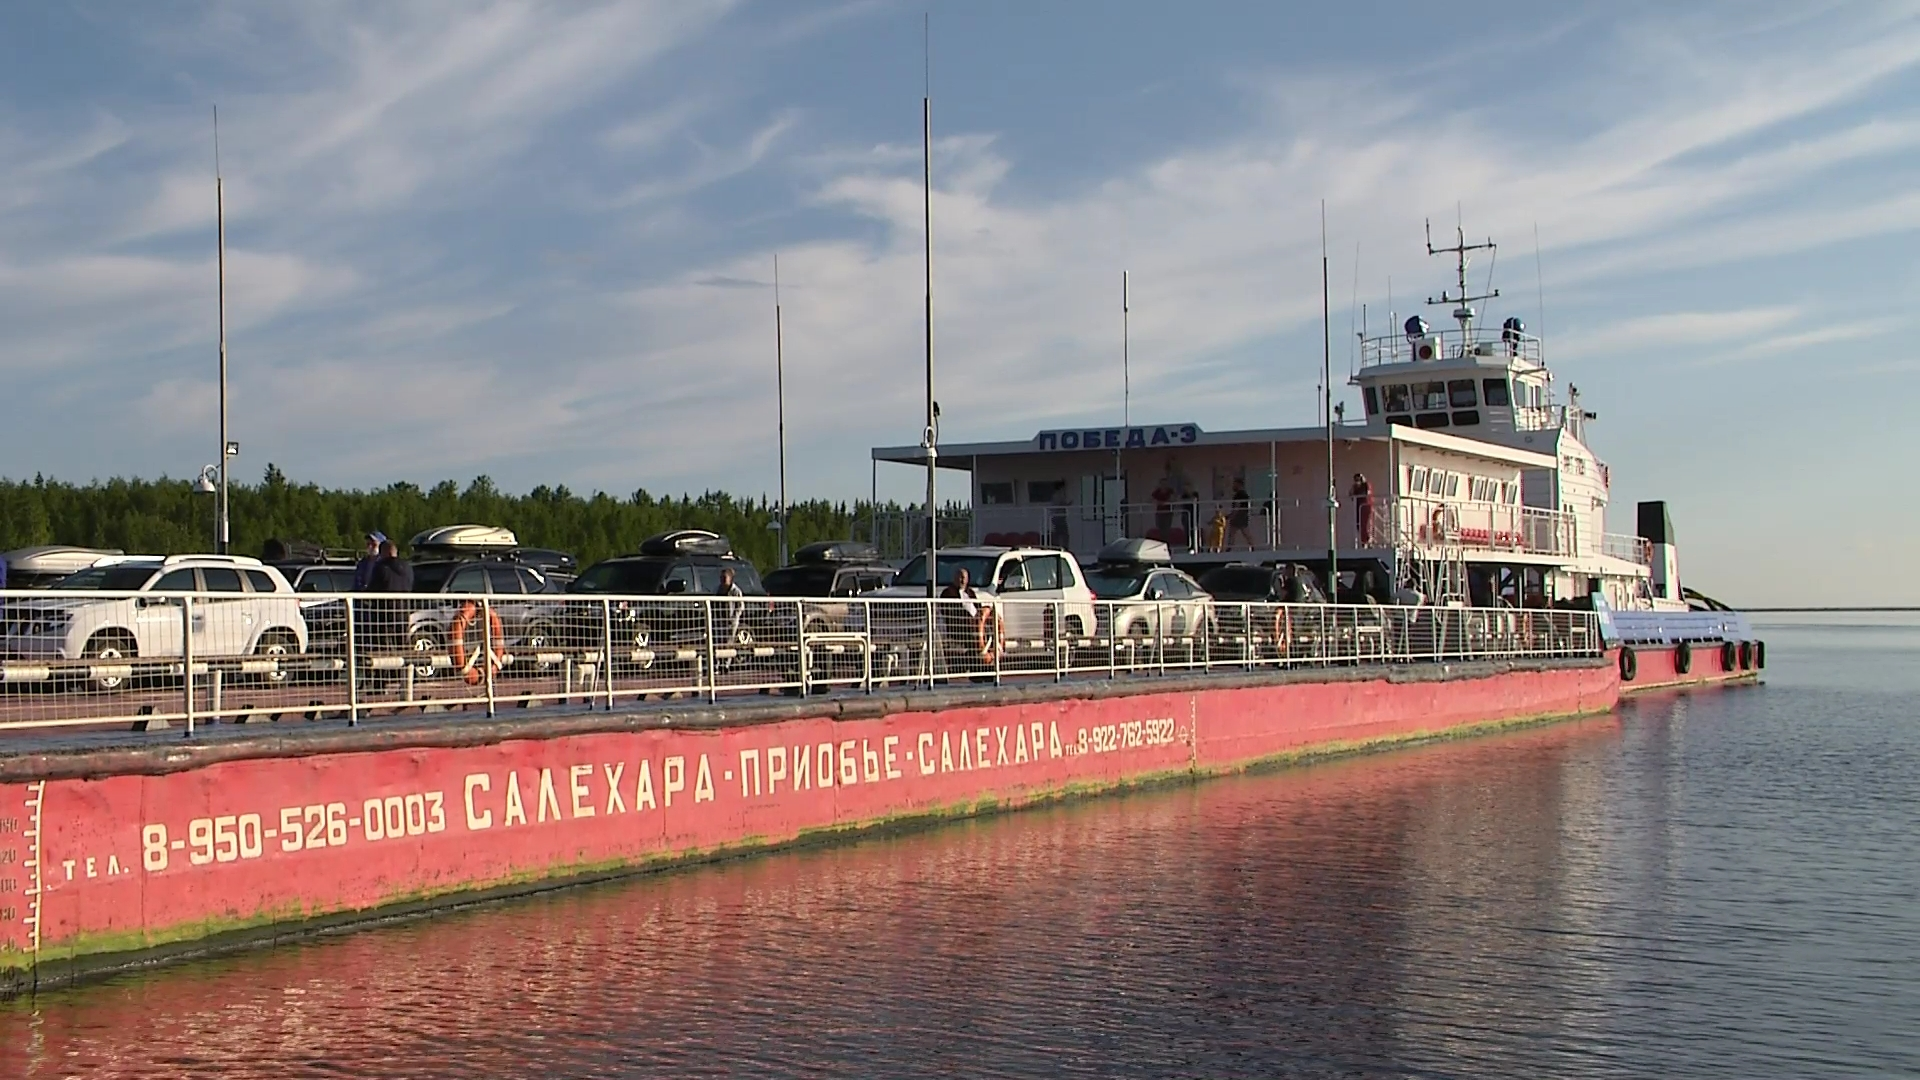 Теплоходы на Ямале перестанут ходить 12 октября